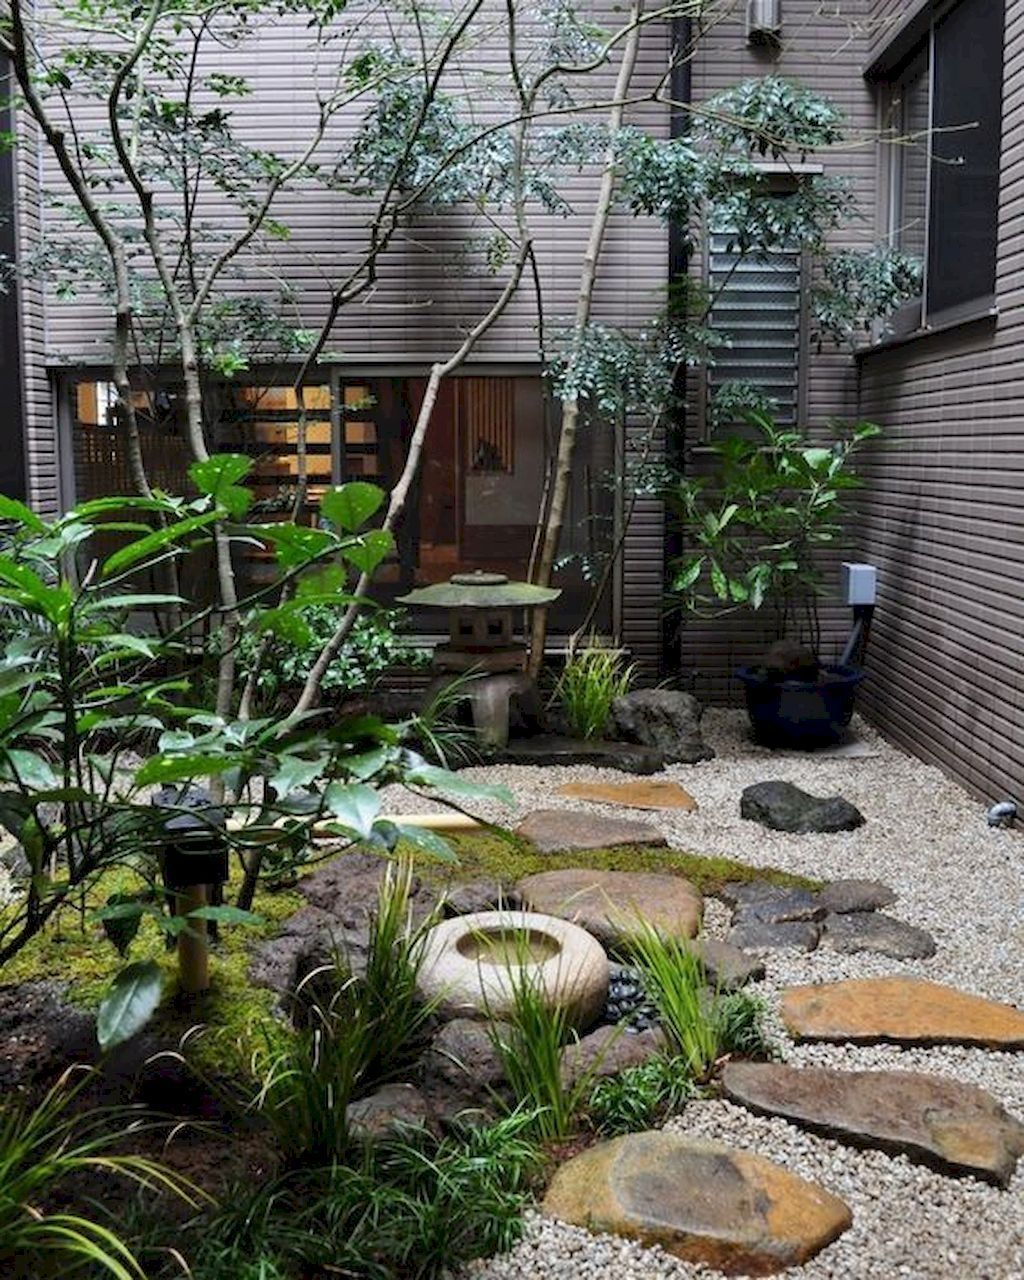 30 Unique Indoor Garden Design Ideas For Fresh House 400 x 300